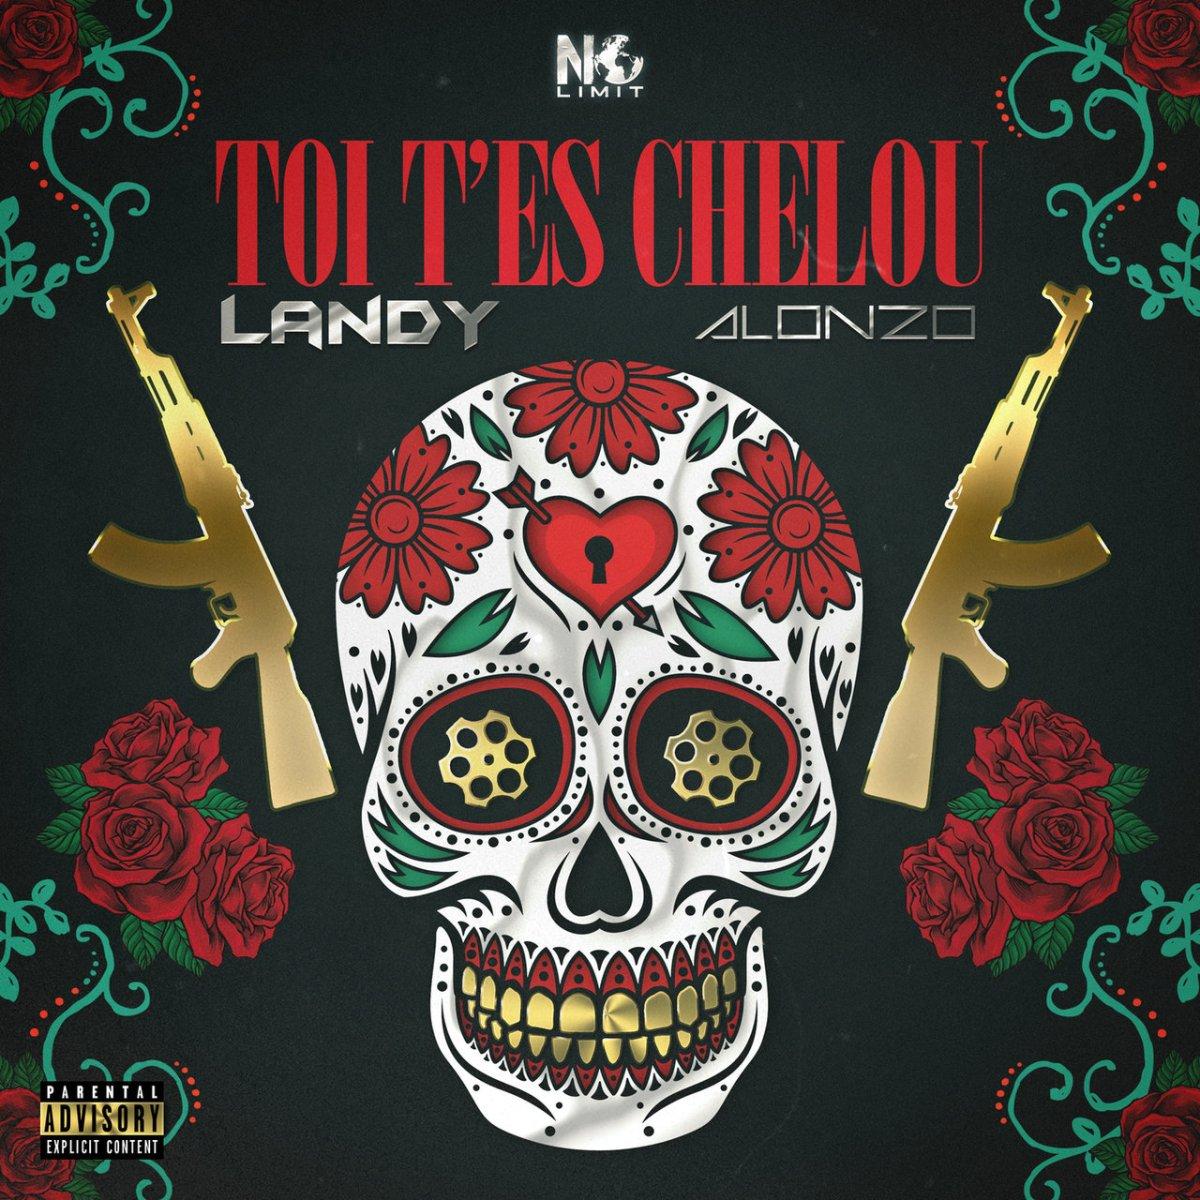 Landy - Toi T'es Chelou (ft. Alonzo) (Cover)